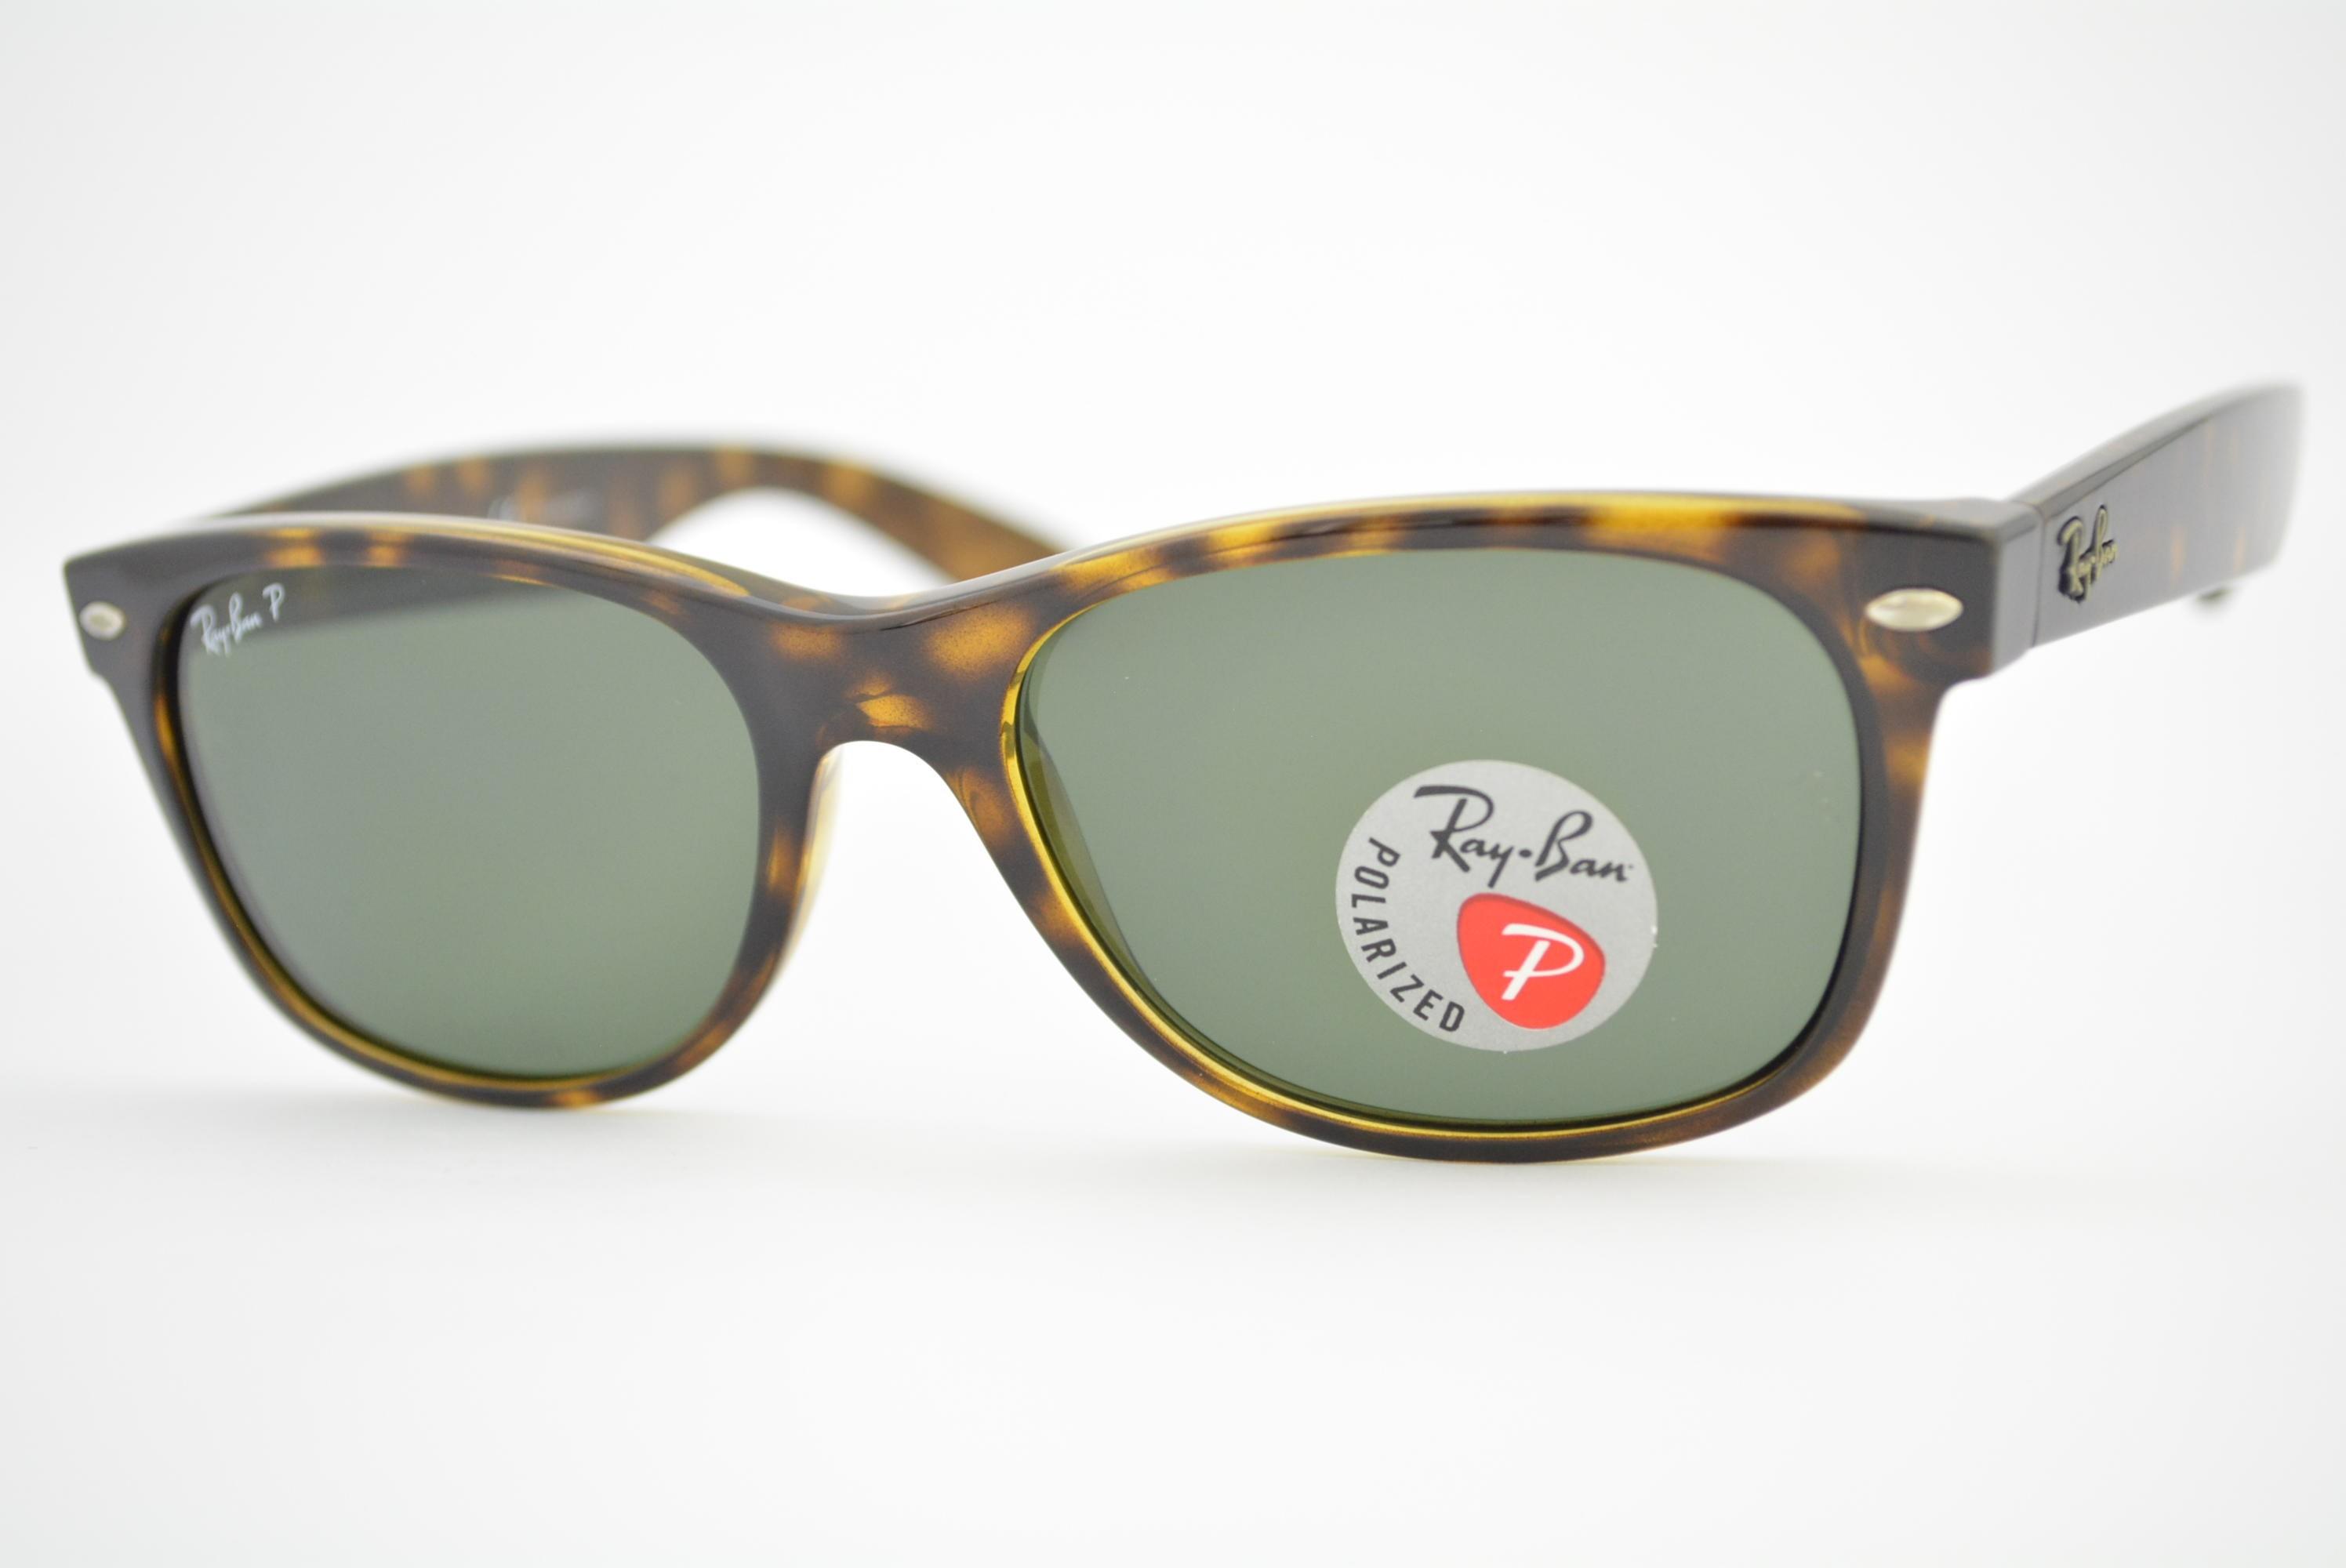 7857848ceb674 óculos de sol Ray Ban New Wayfarer mod rb2132 902 58 Polarizado tamanho 55